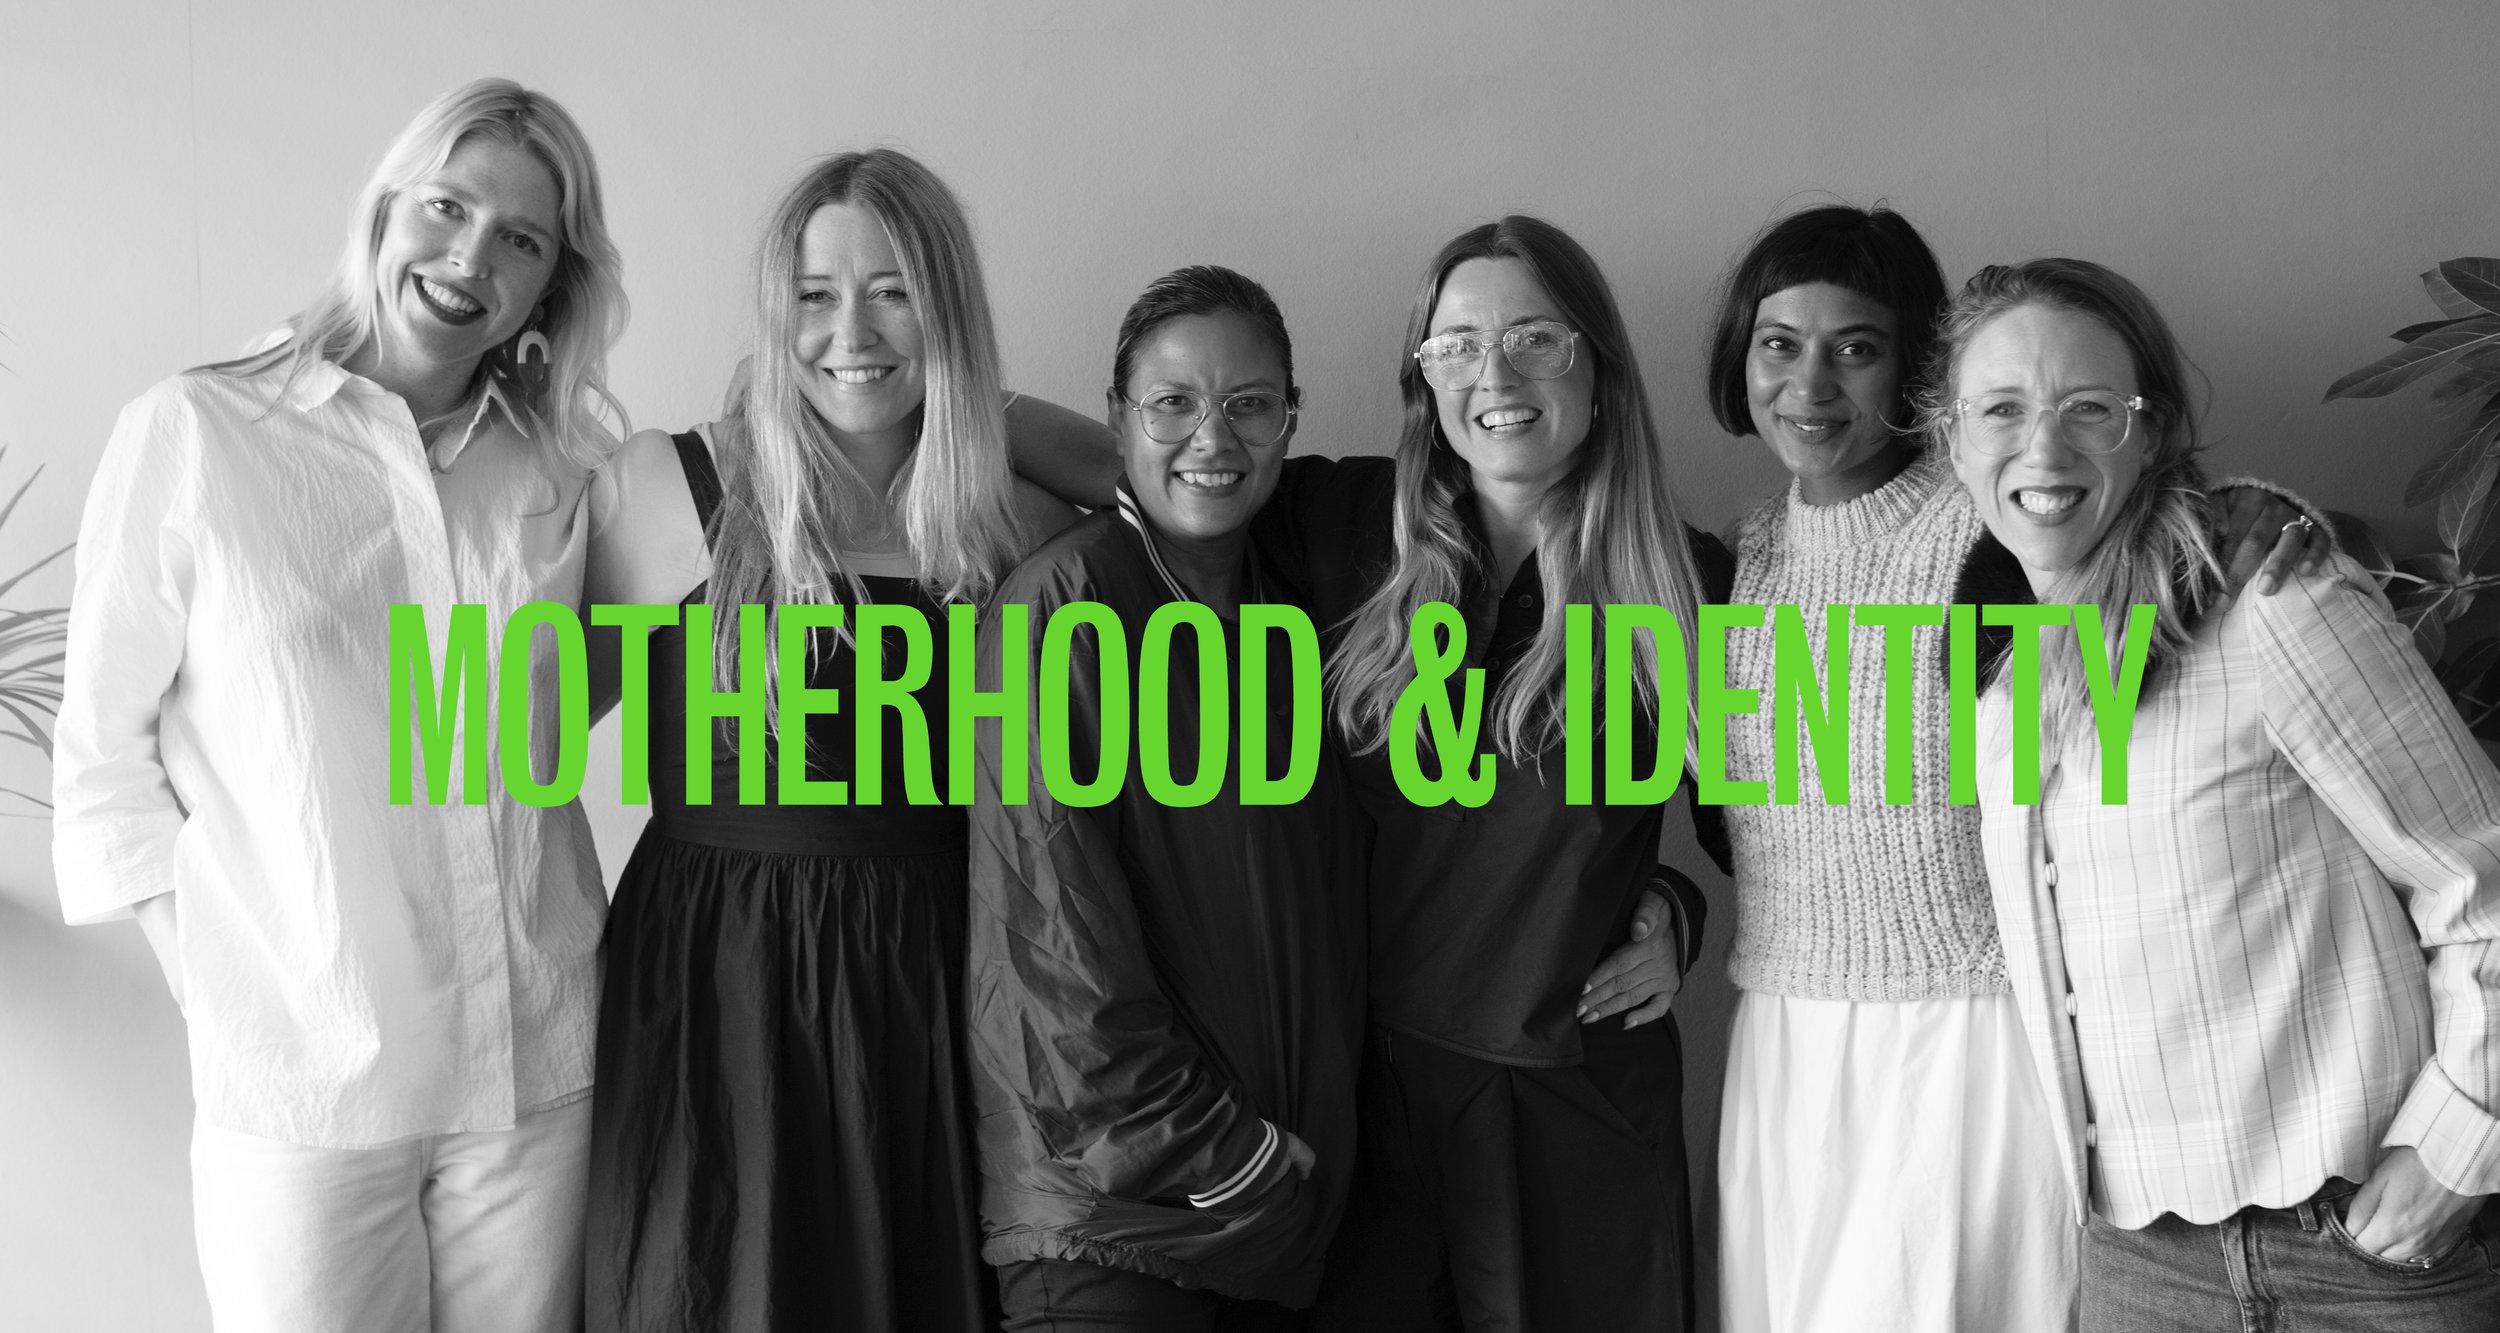 Motherhood & Identity panel (L-R) Danielle Pender, Anna Jones, Leila Fataar, Leanne Cloudsdale, Heta Fell, Pip Black